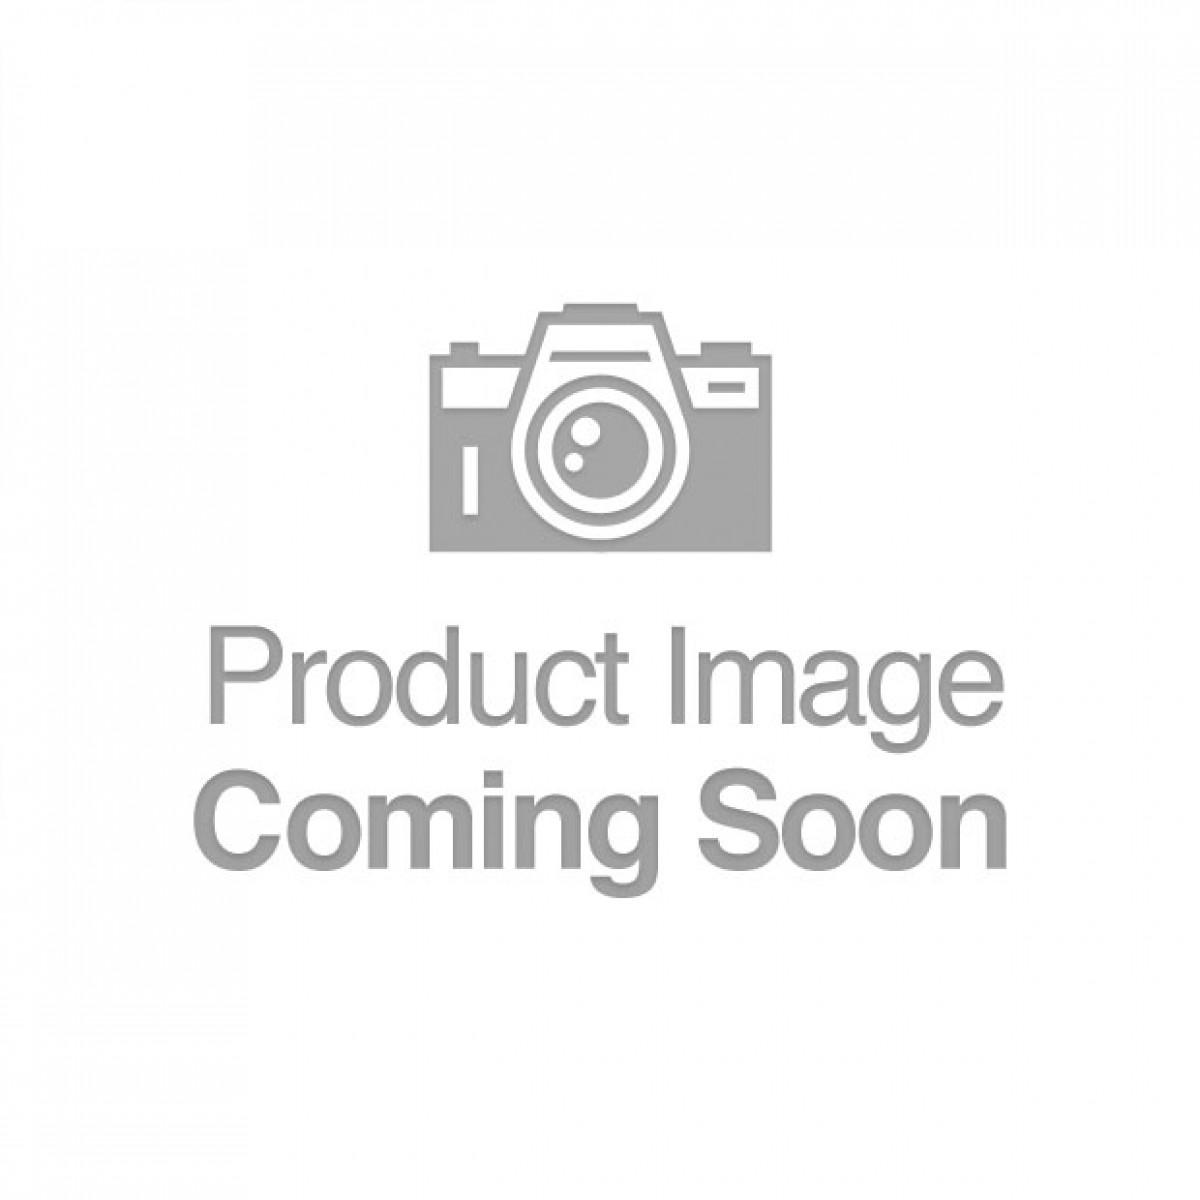 Boneyard The Man Sizer 3X Stretch Silicone Extender - Black